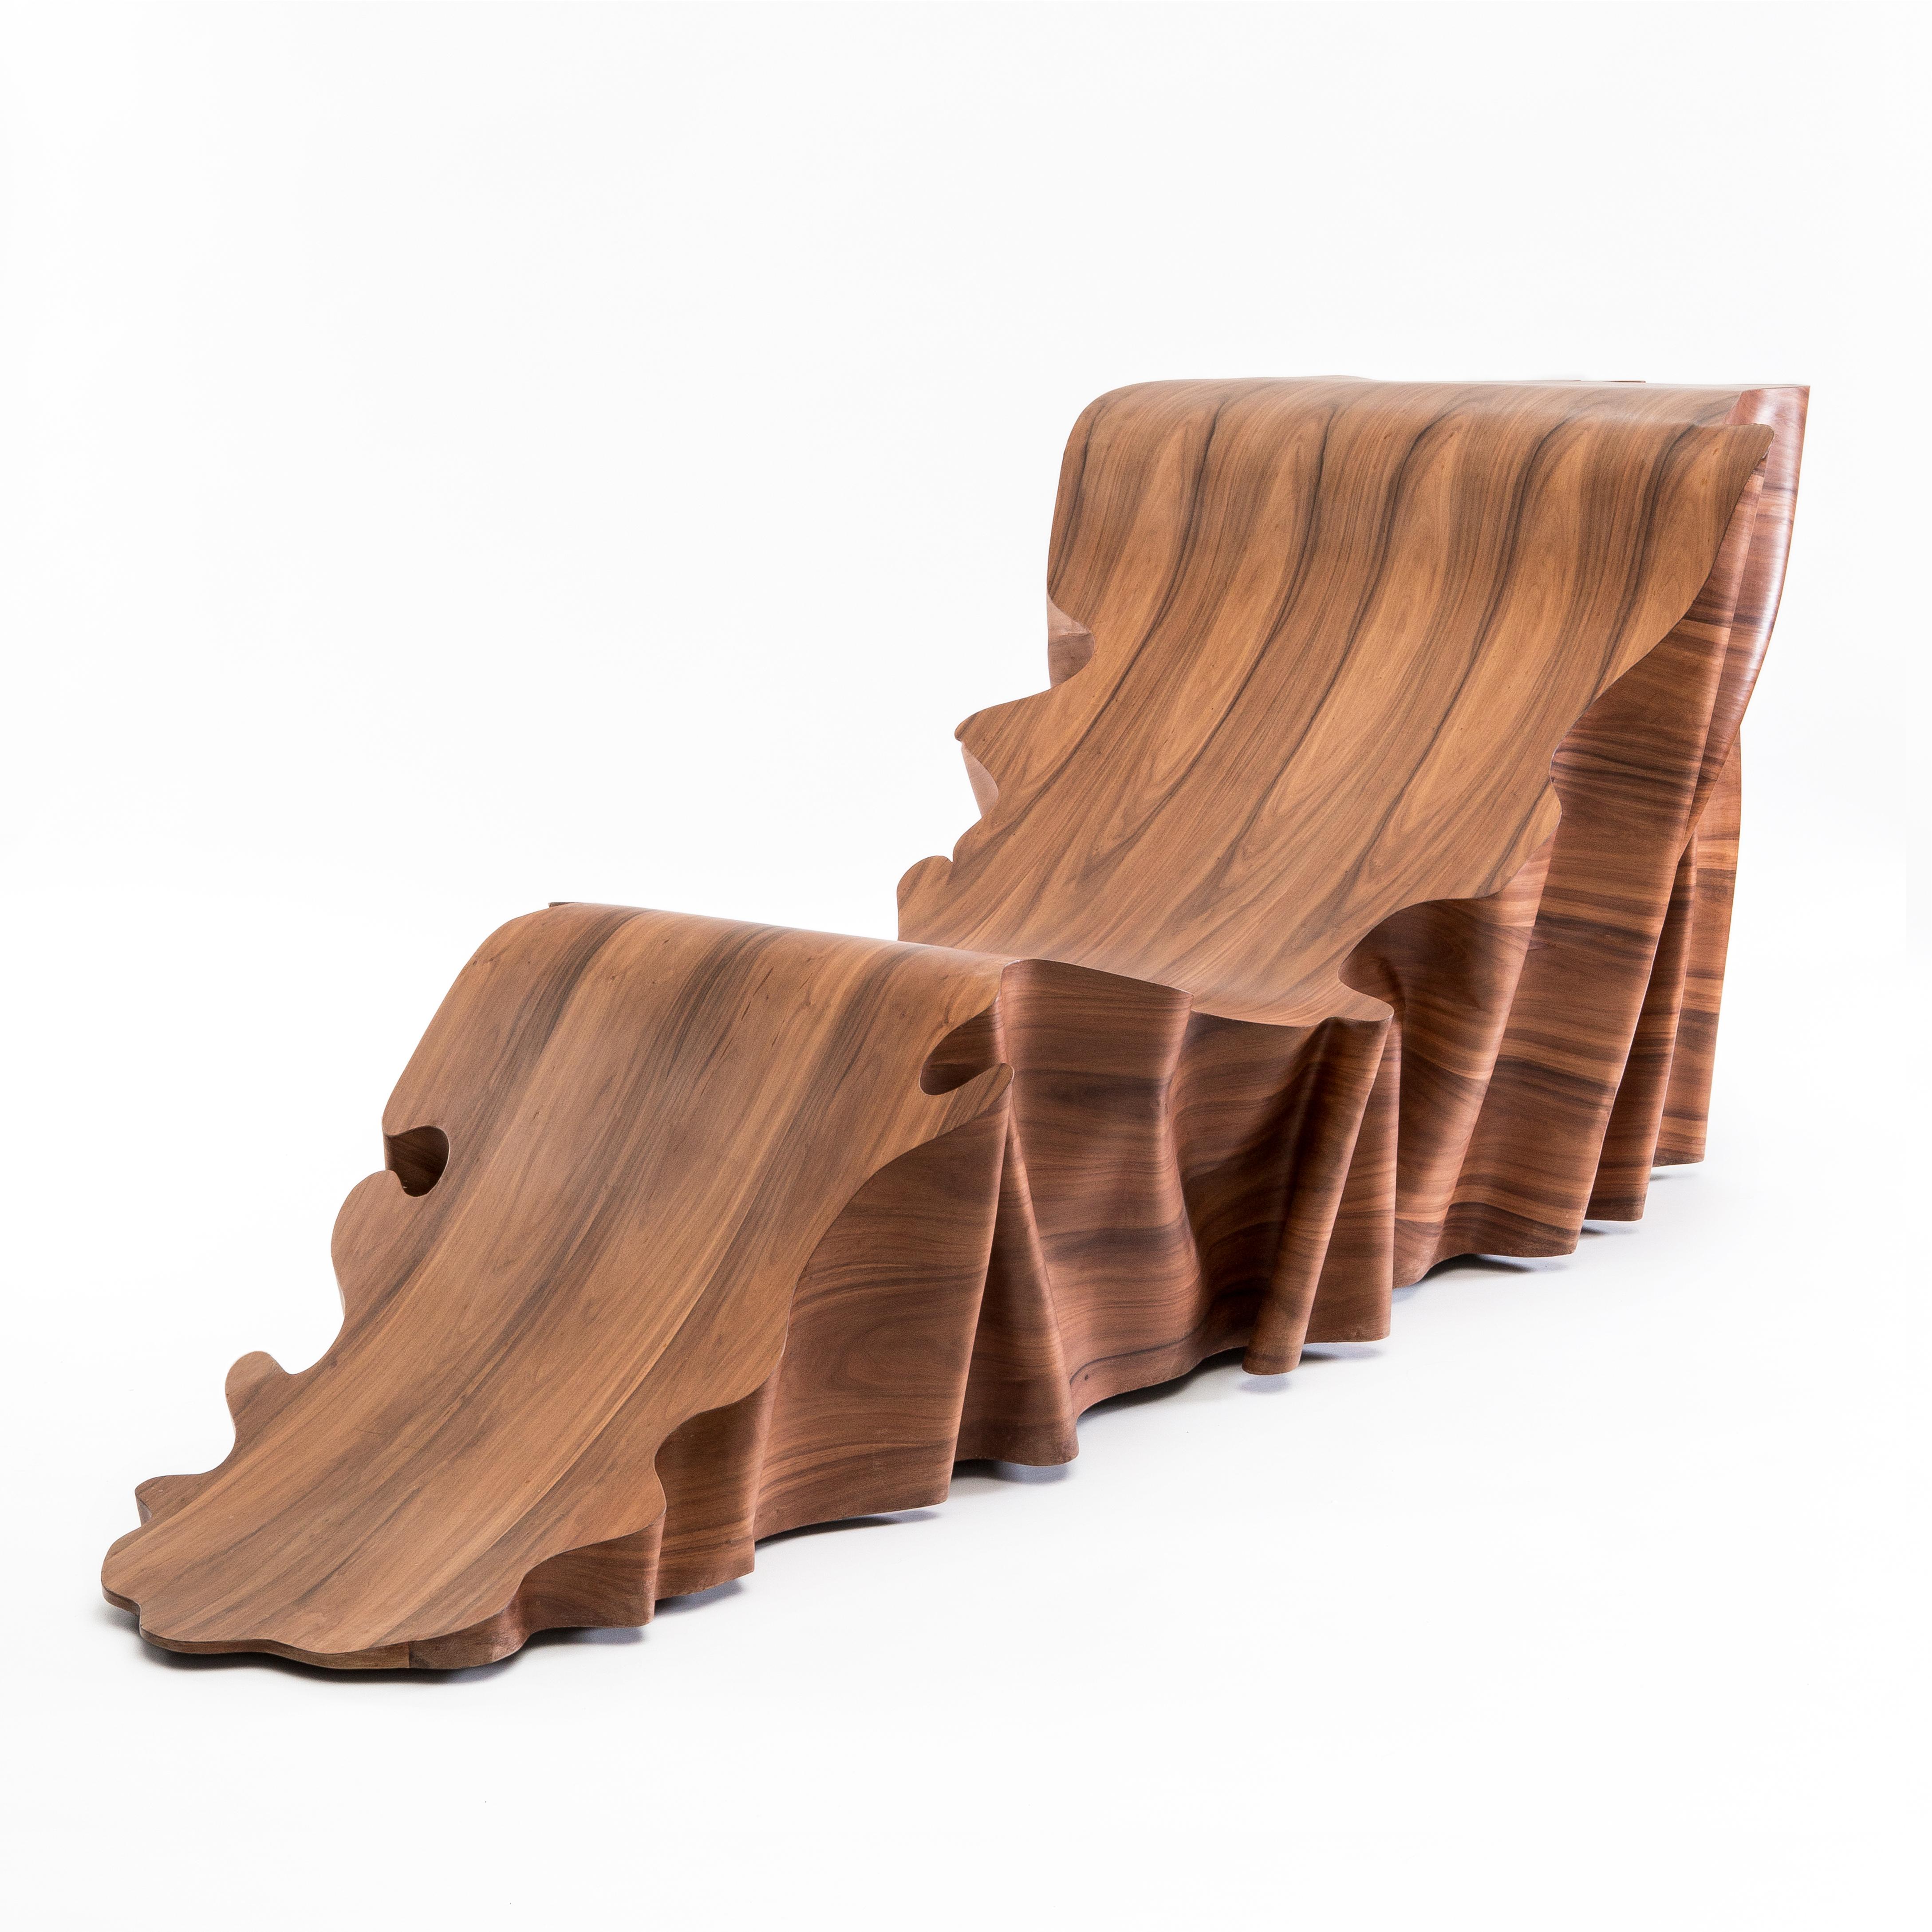 Chaise longue 2 1stdibs